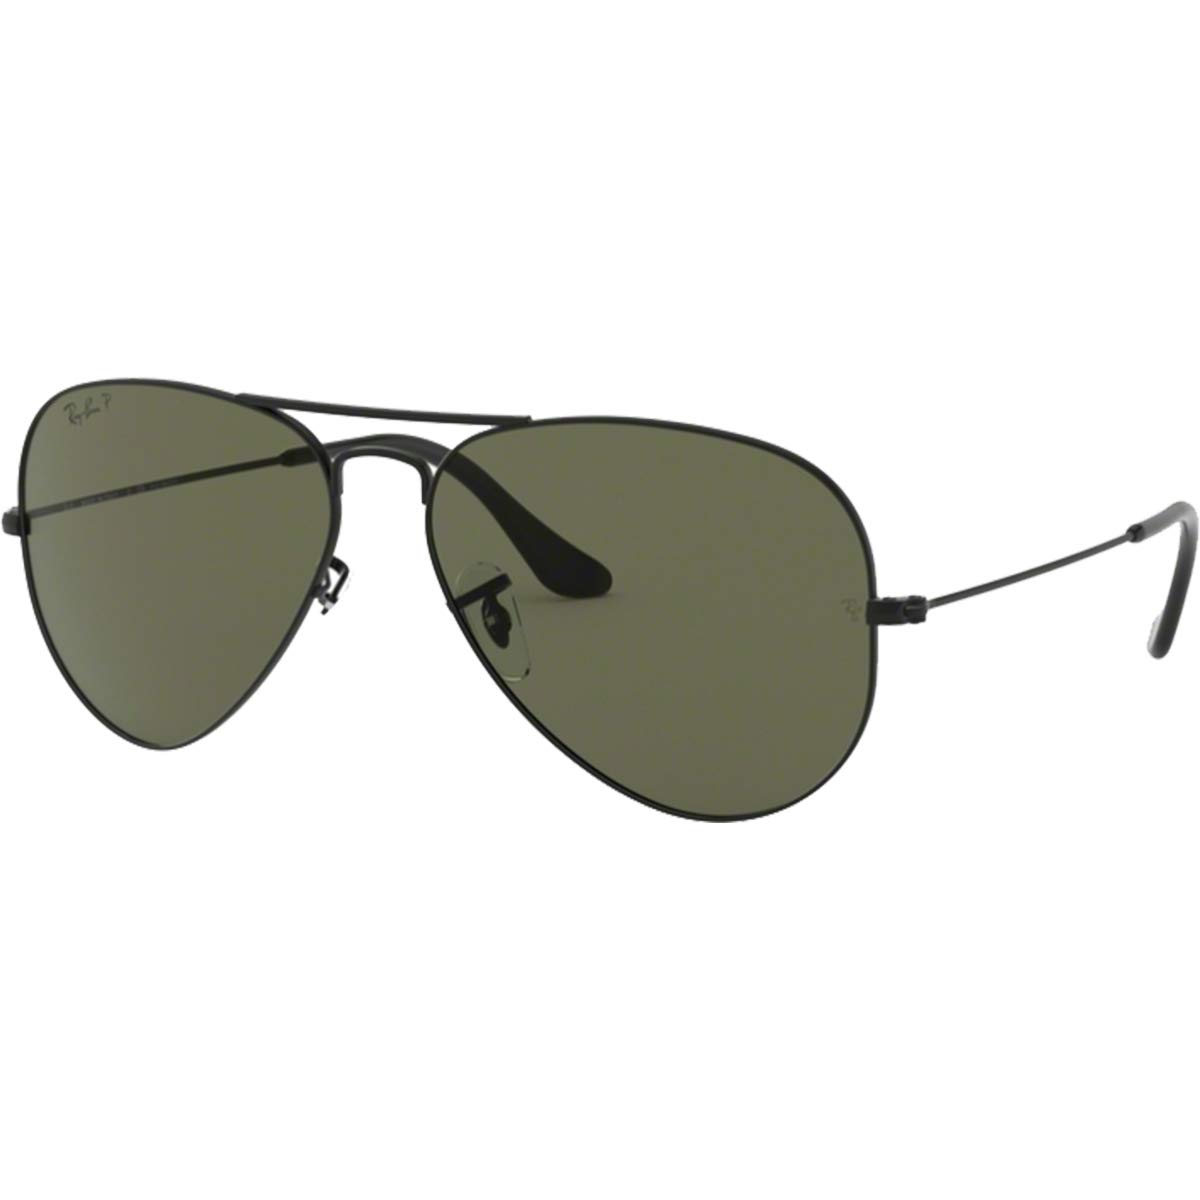 Ray-Ban RB3025 Aviator Large Metal Sunglasses,58mm,Matte Black/Polar Green by Ray-Ban